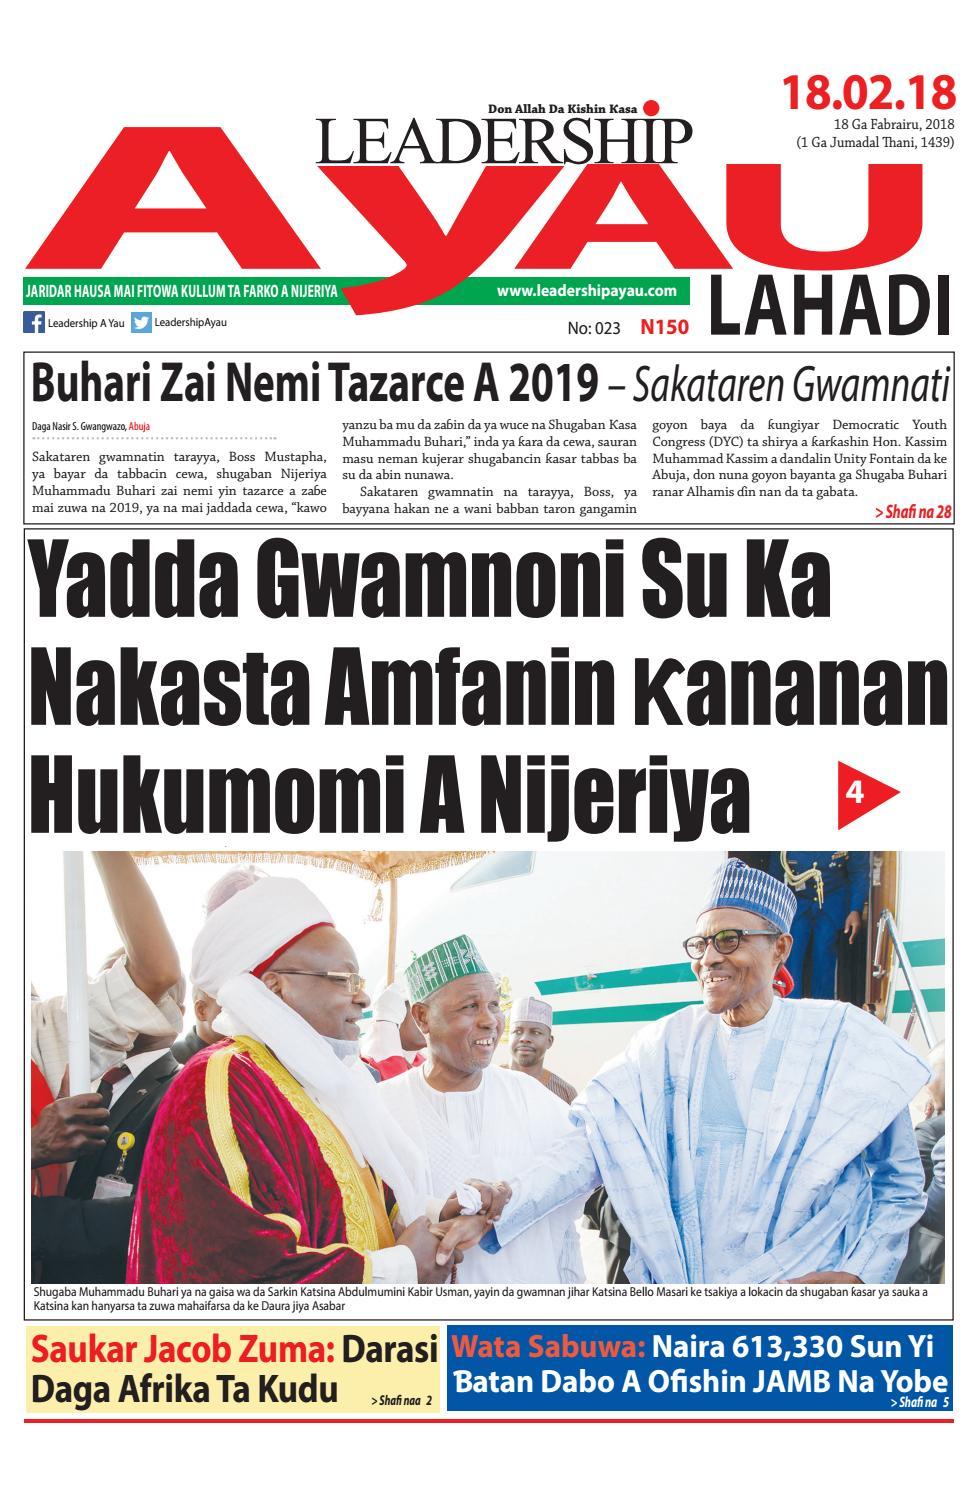 LEADERSHIP A Yau Lahadi E-PAPER, 18 Ga Fabrairu, 2018 by